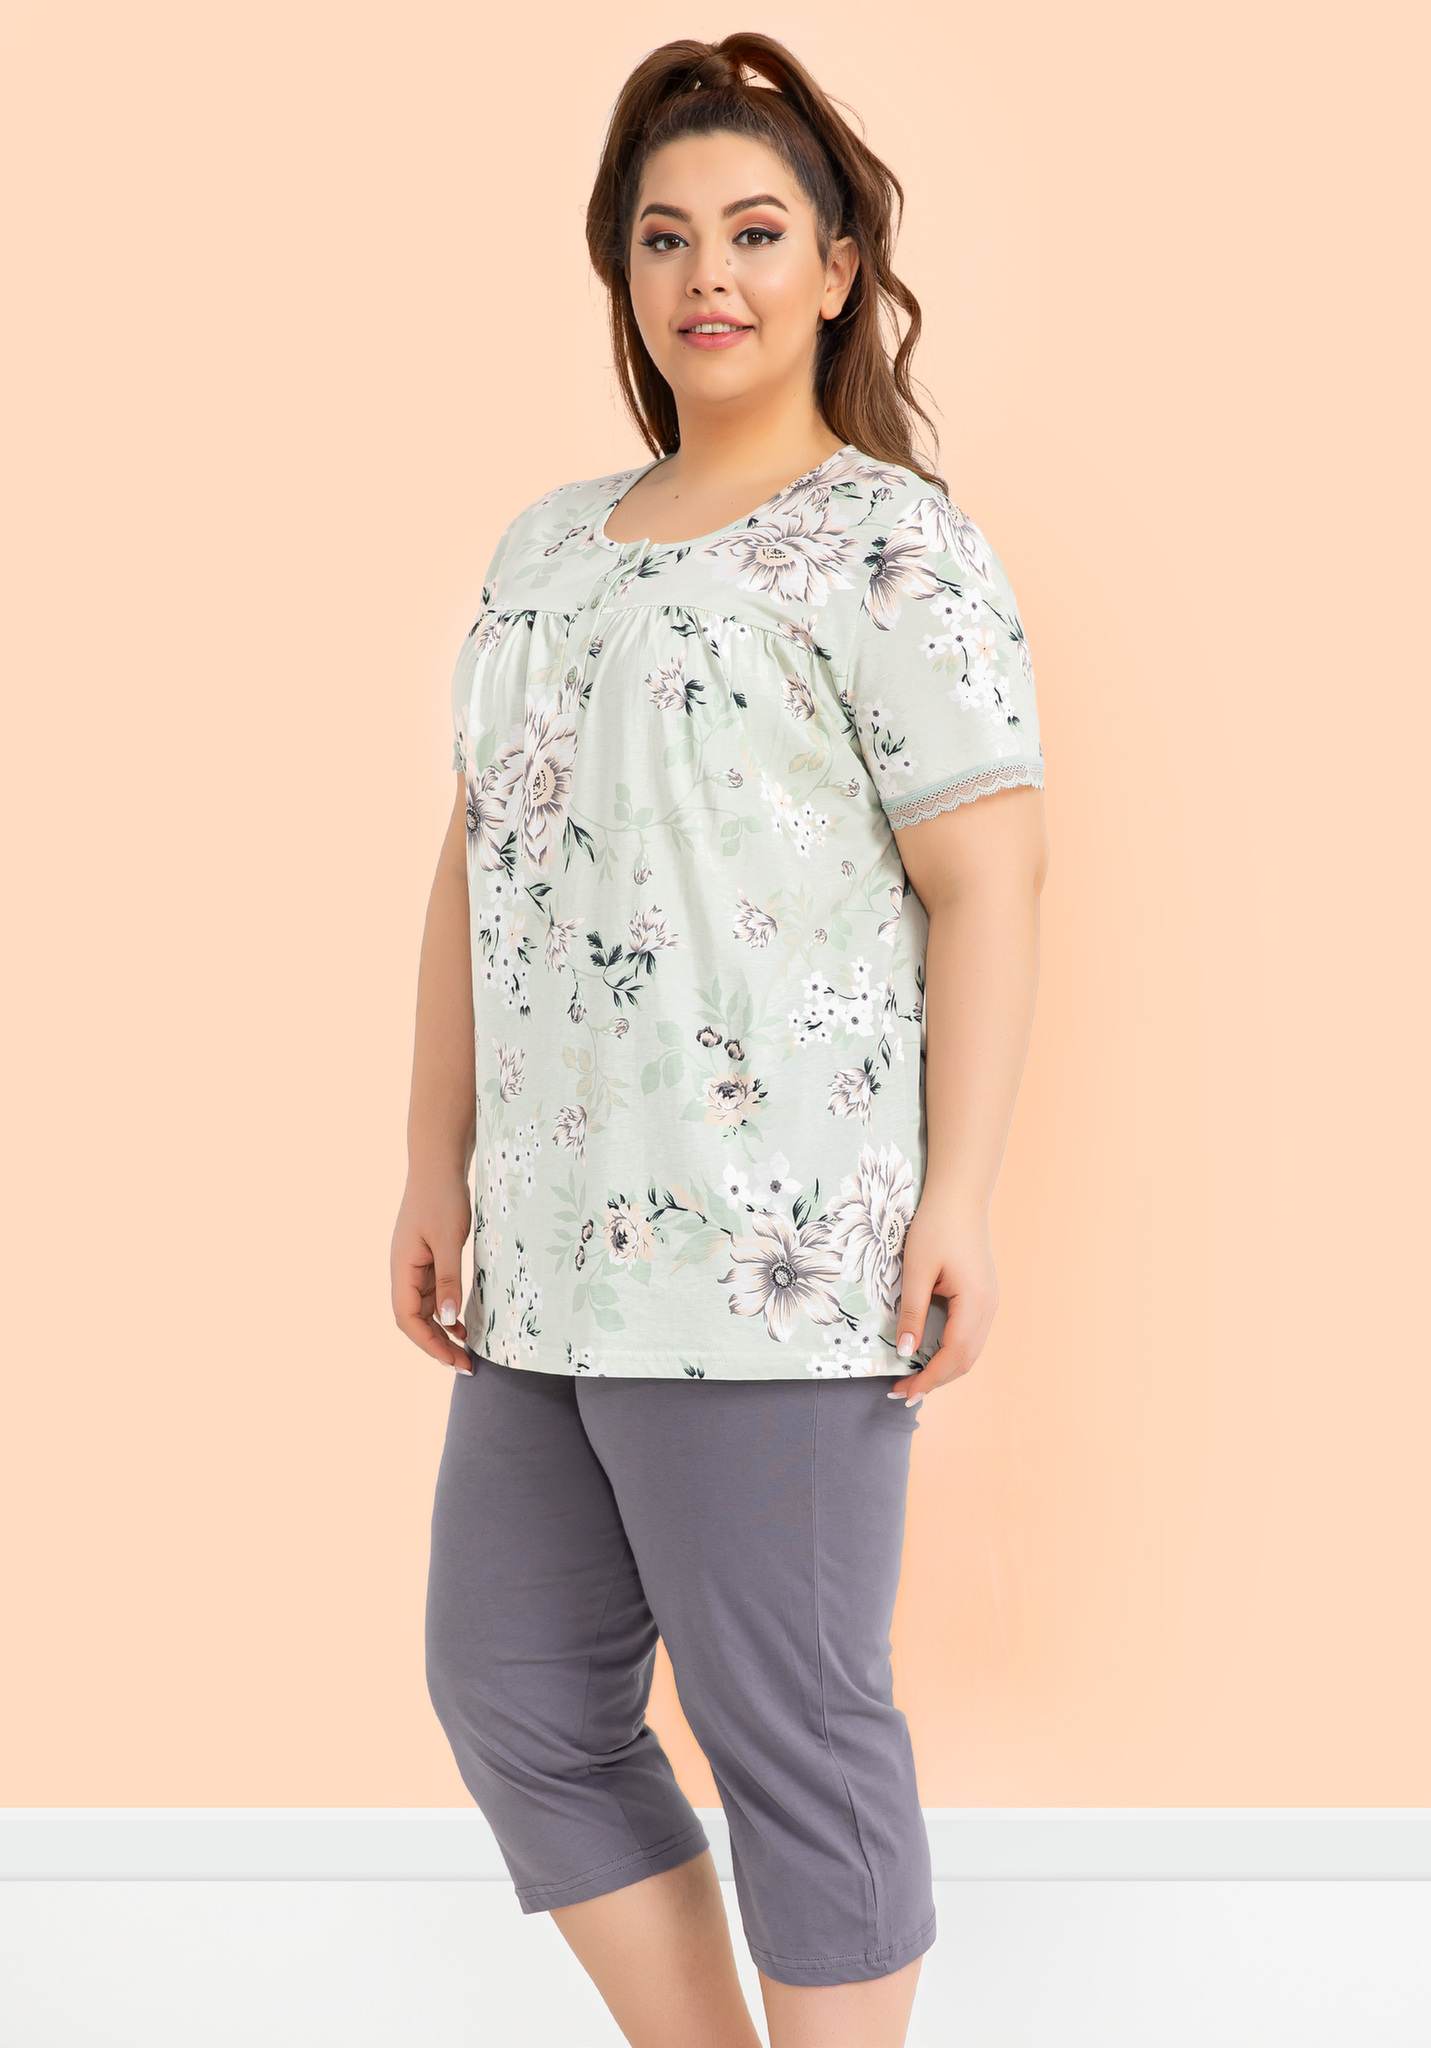 Комплект (футболка, бриджи) P-52642 Sabrina